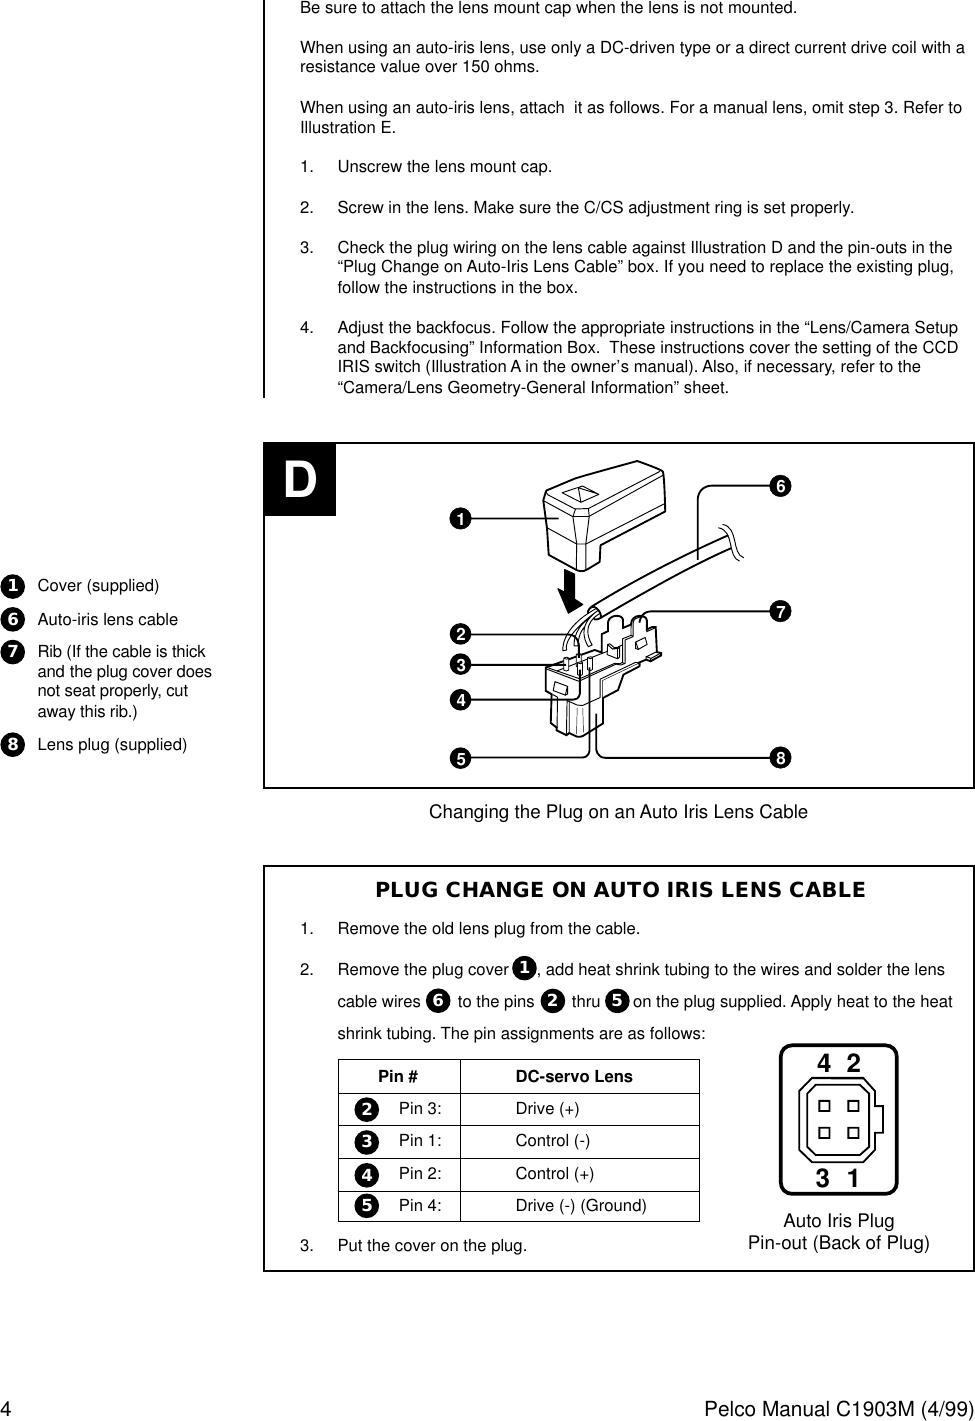 Wiring Extra Lights To Garage Door Opener Wire Data Schema Switch Diagram Fancy Pelco Camera Vignette Electrical Commercial Genie